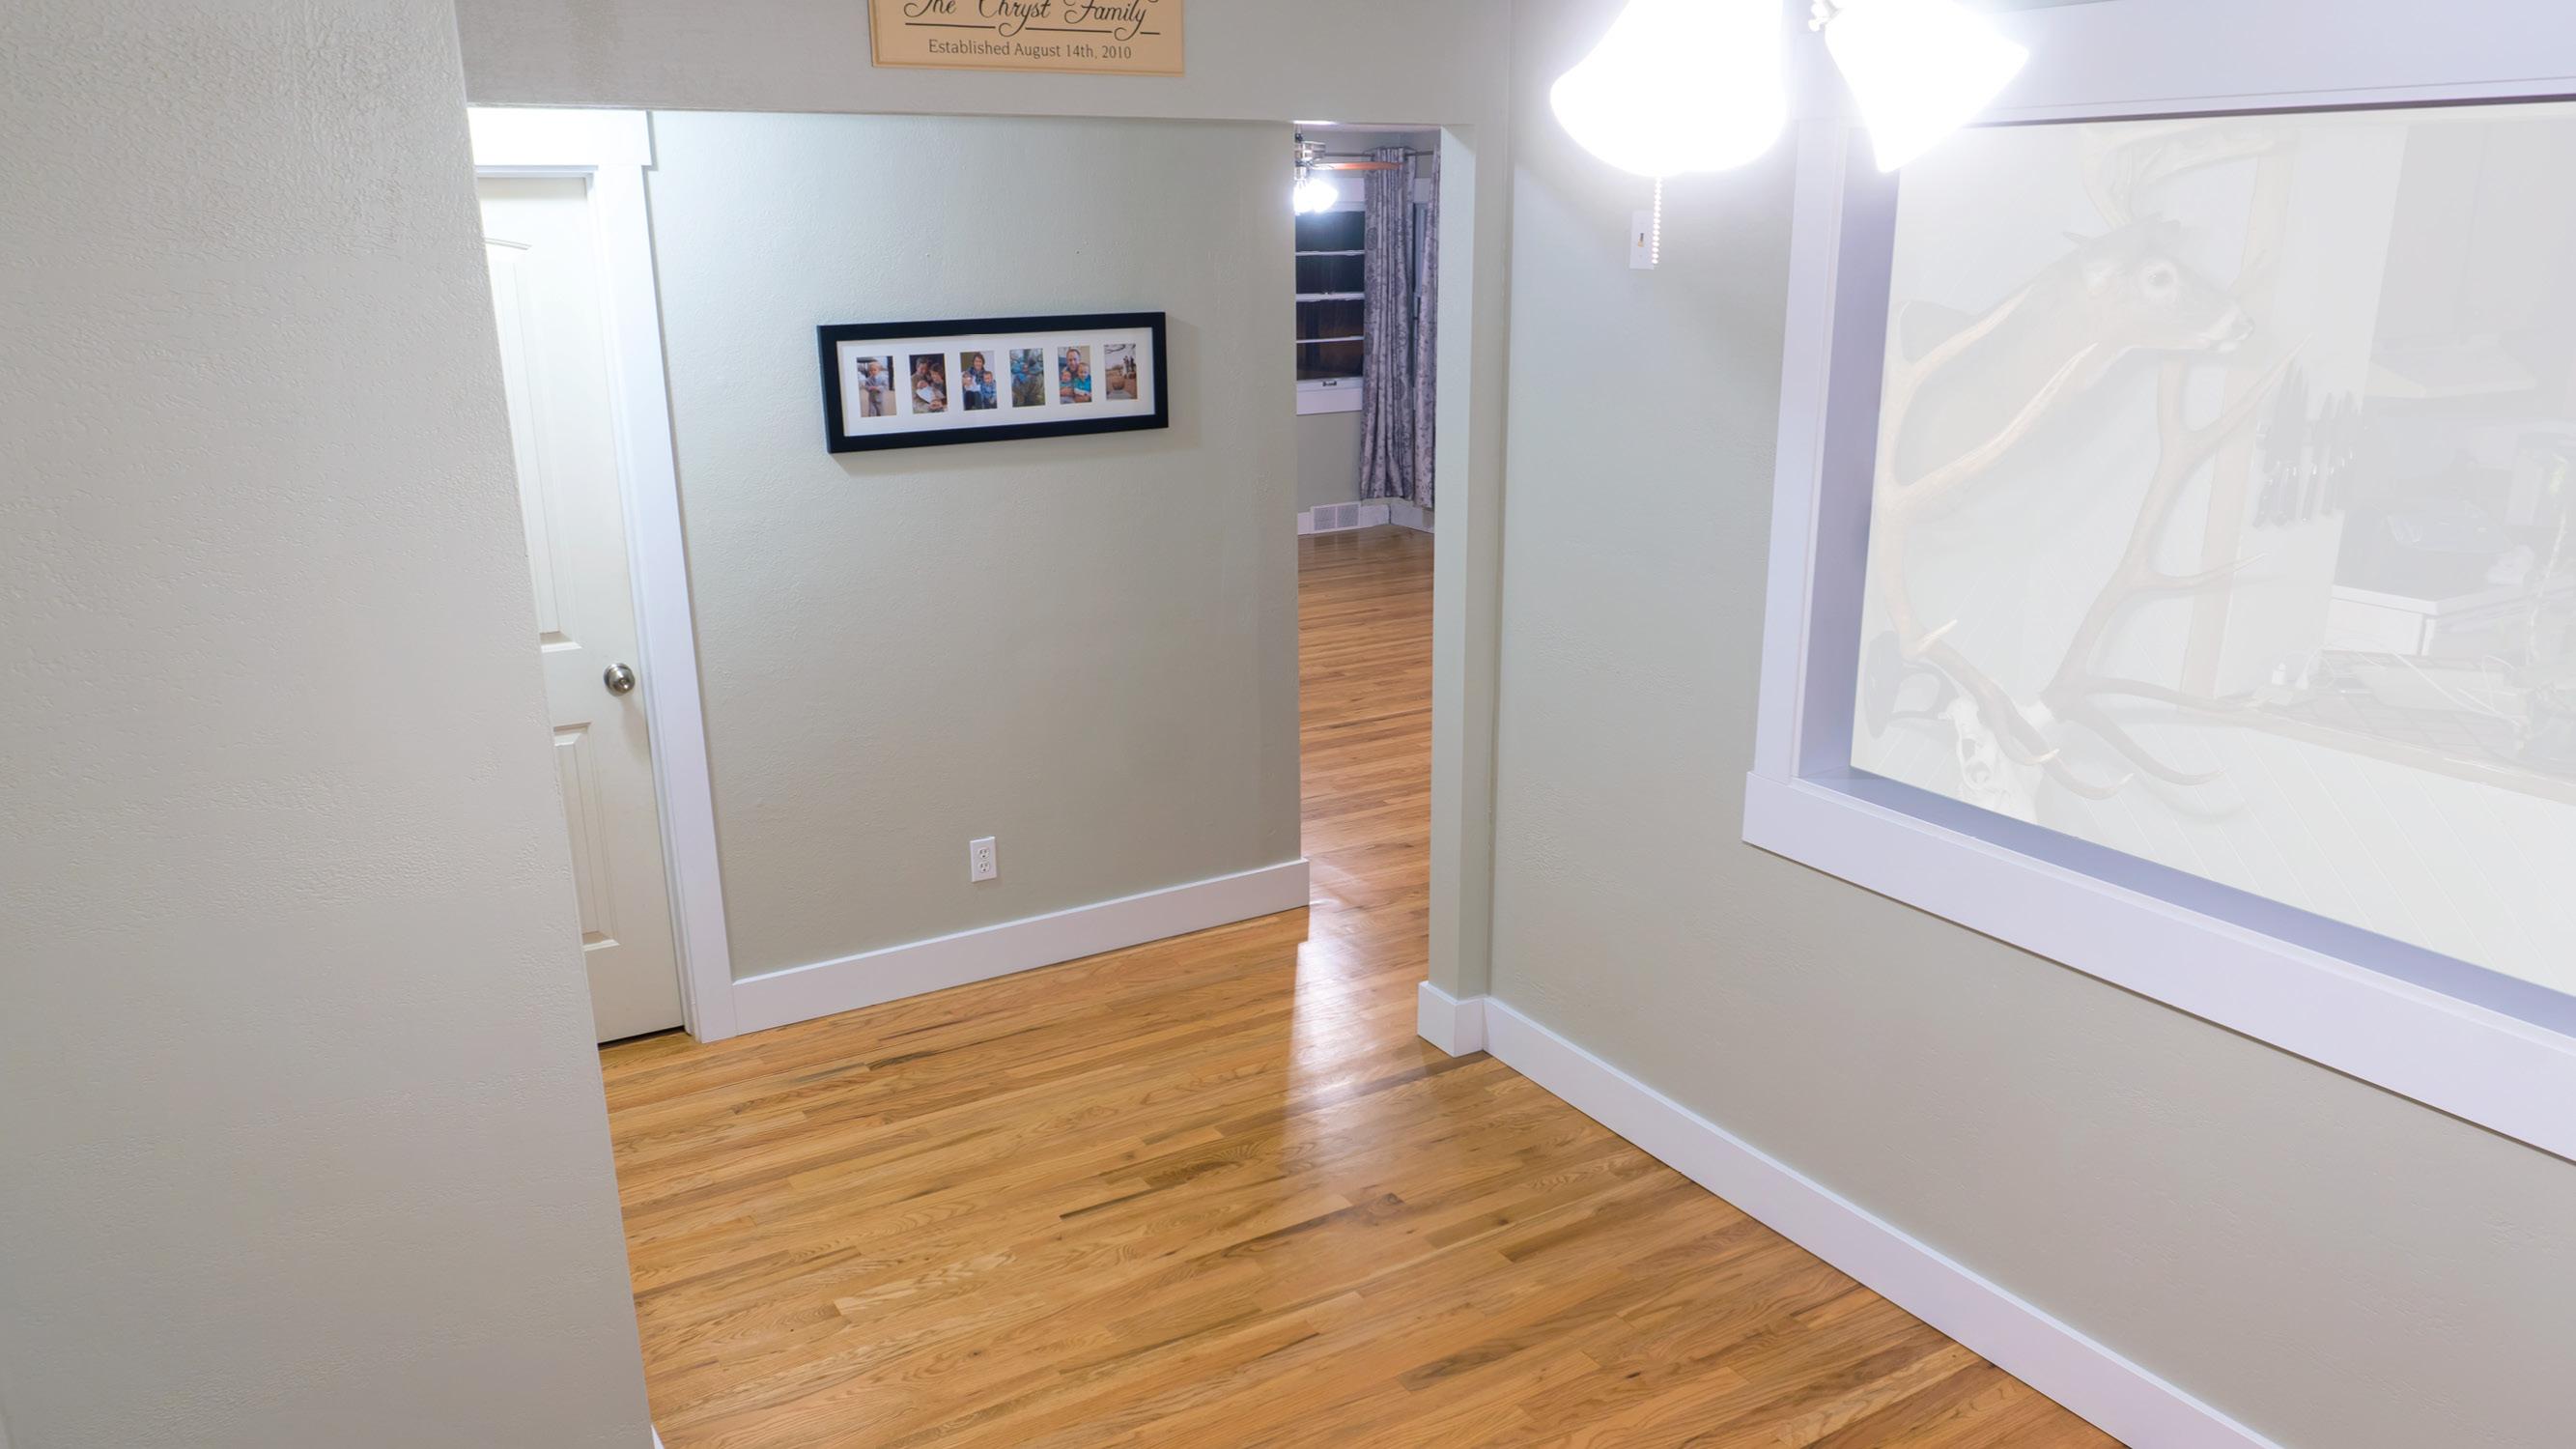 Painting & Hanging Doors & Trim